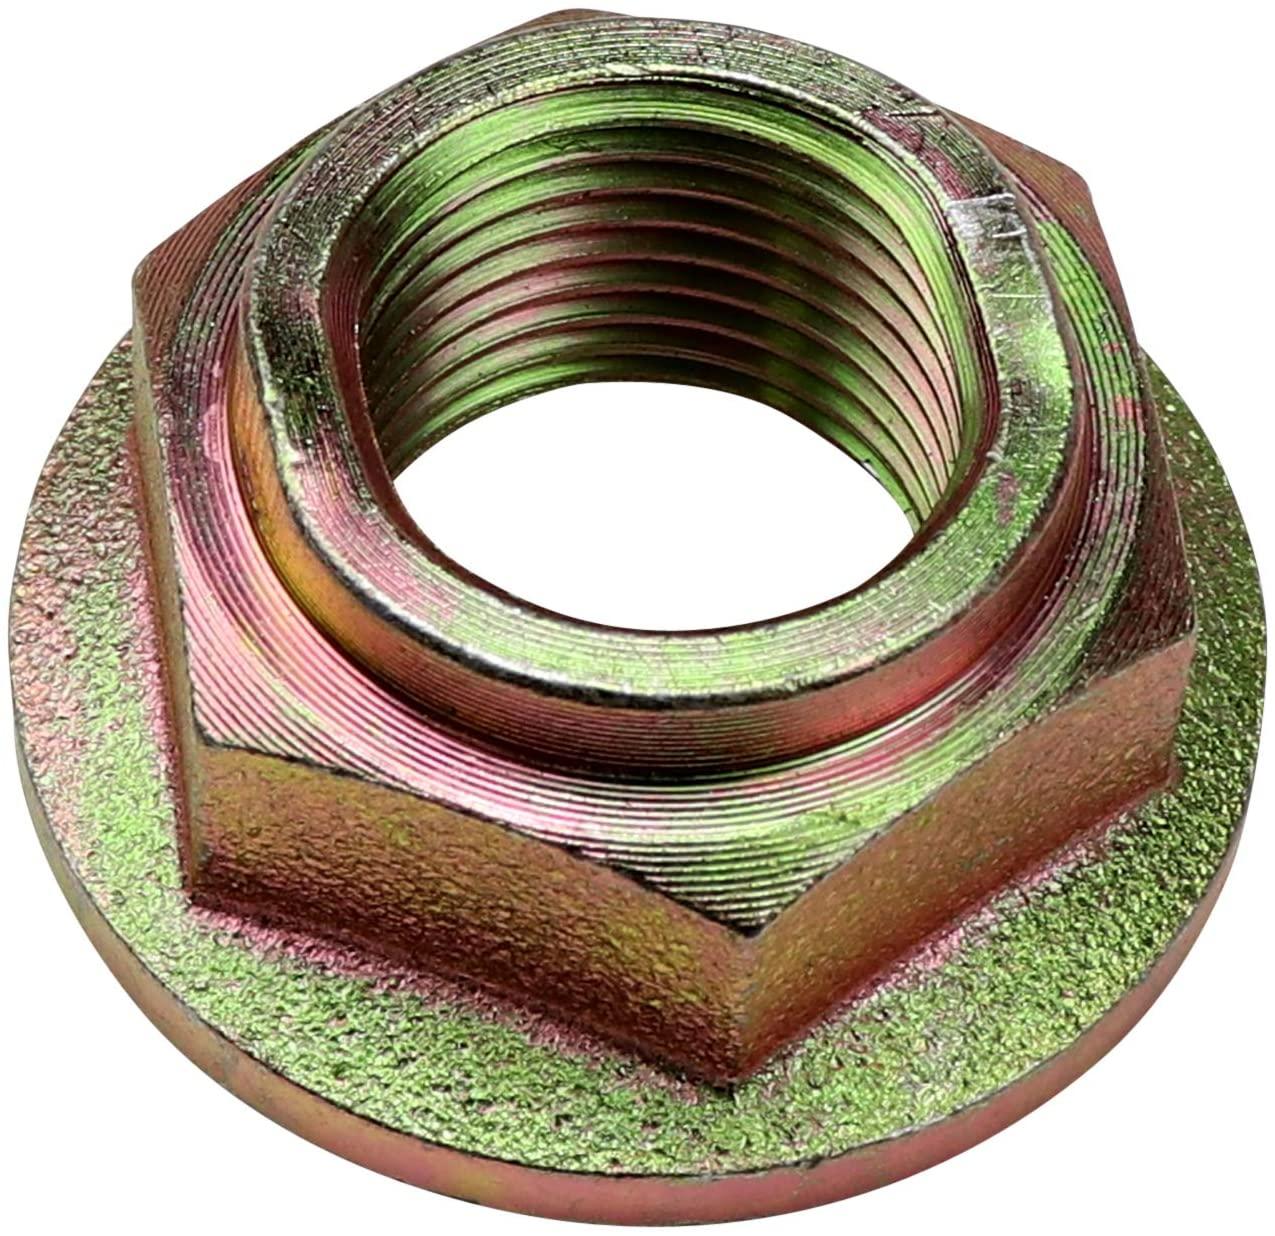 BECKARNLEY 103-3110 Axle Nut